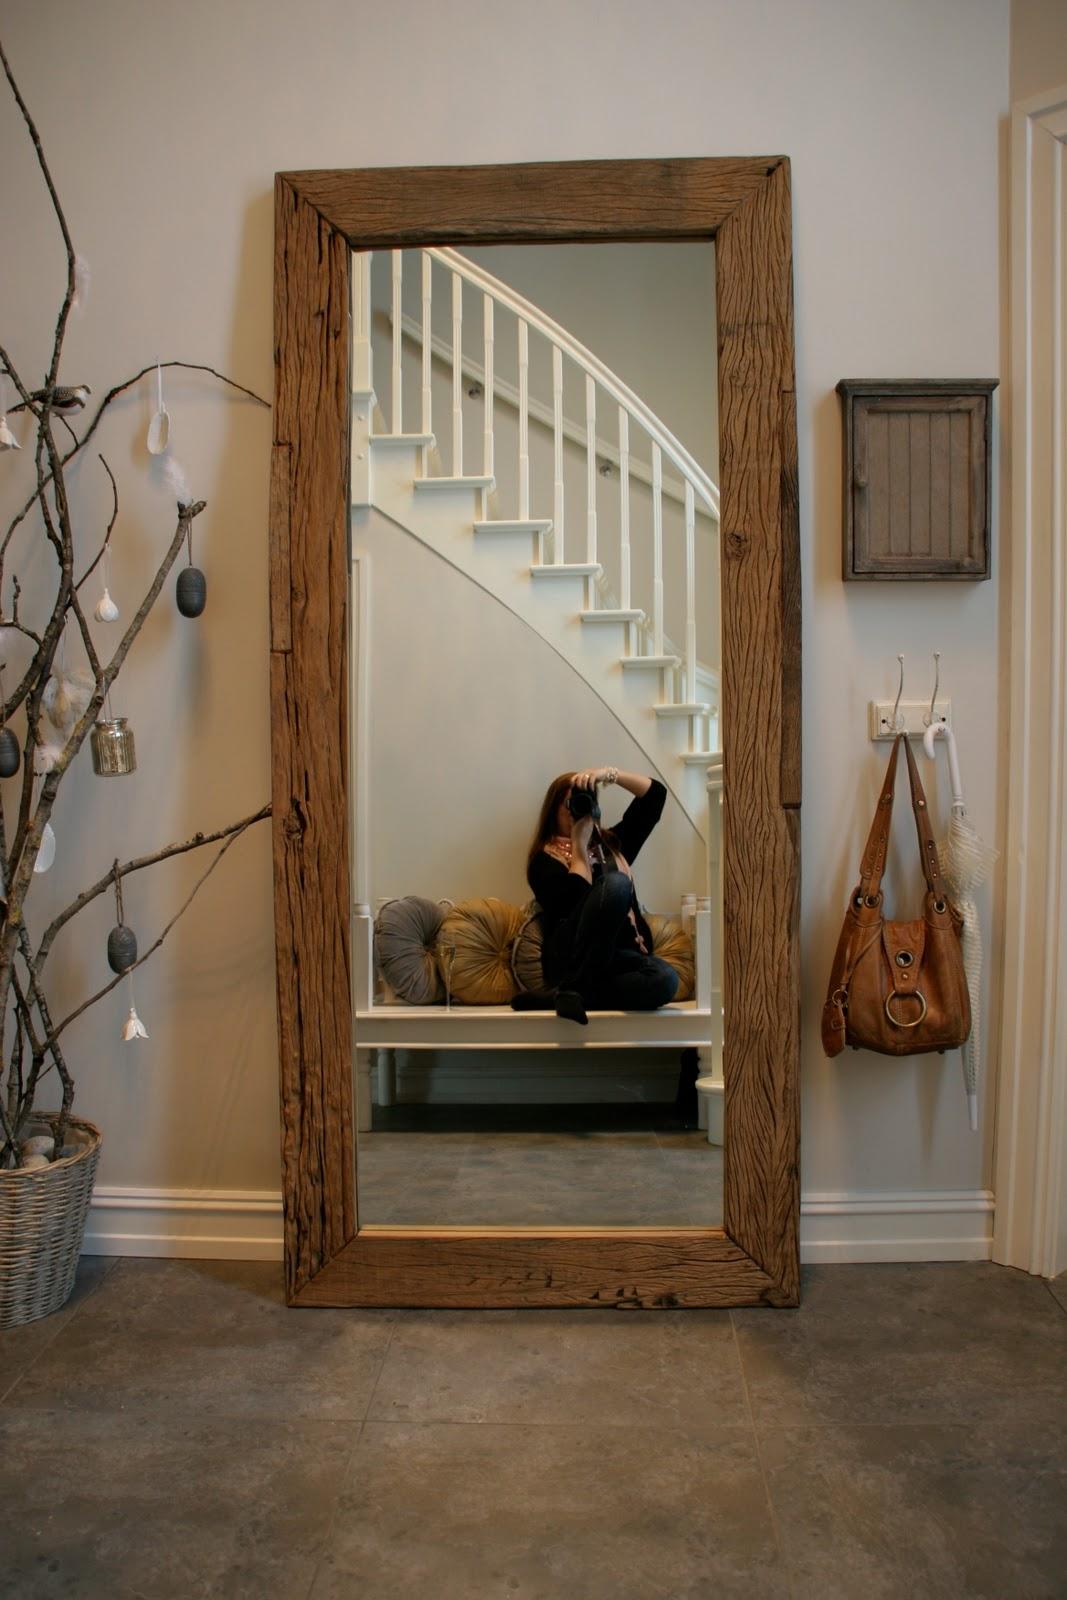 house doctor speil i hallen villa von krogh. Black Bedroom Furniture Sets. Home Design Ideas